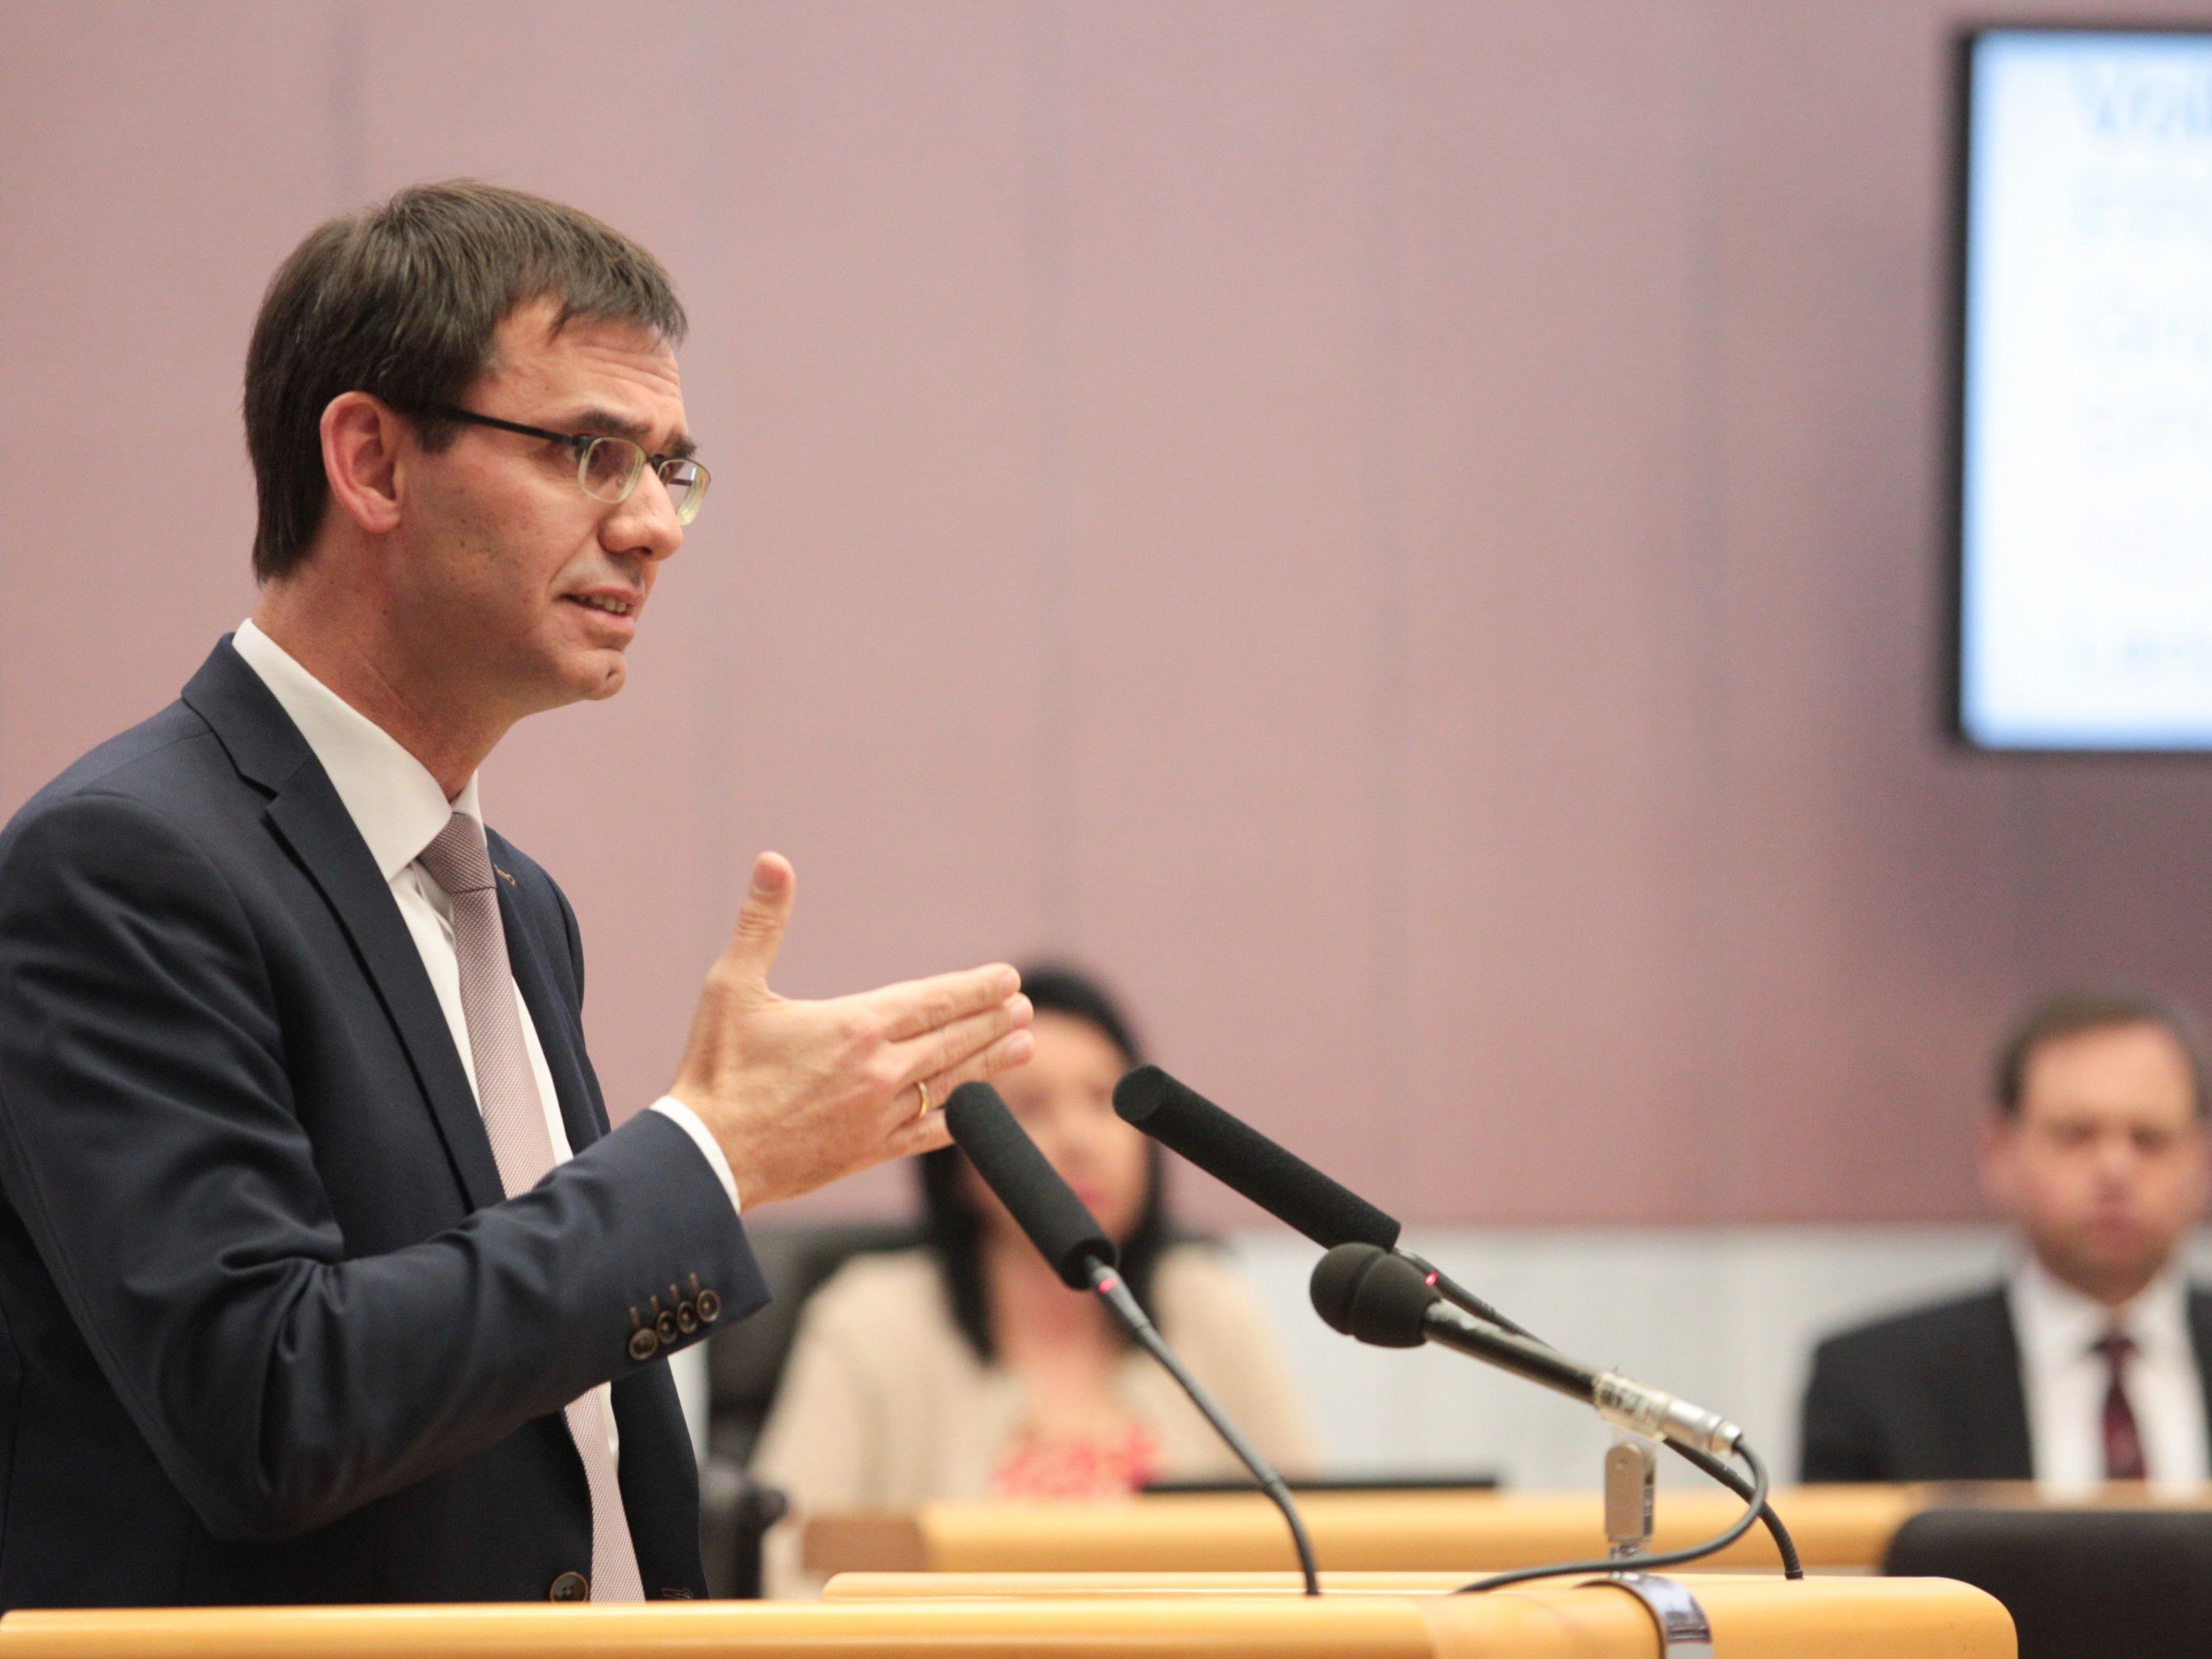 Markus Wallner begrüßt den Rückgang der Arbeitslosigkeit im Ländle.